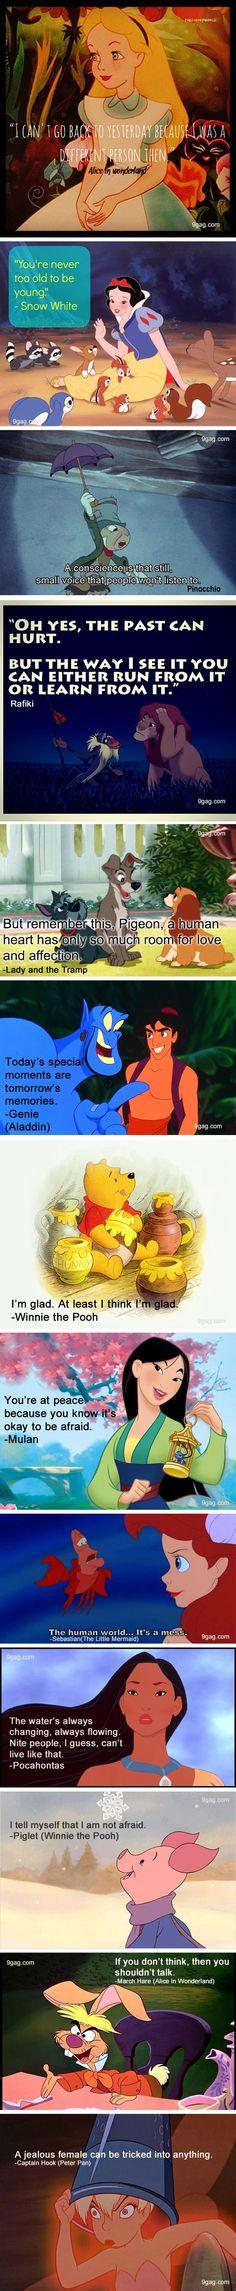 Grandes frases de Disney